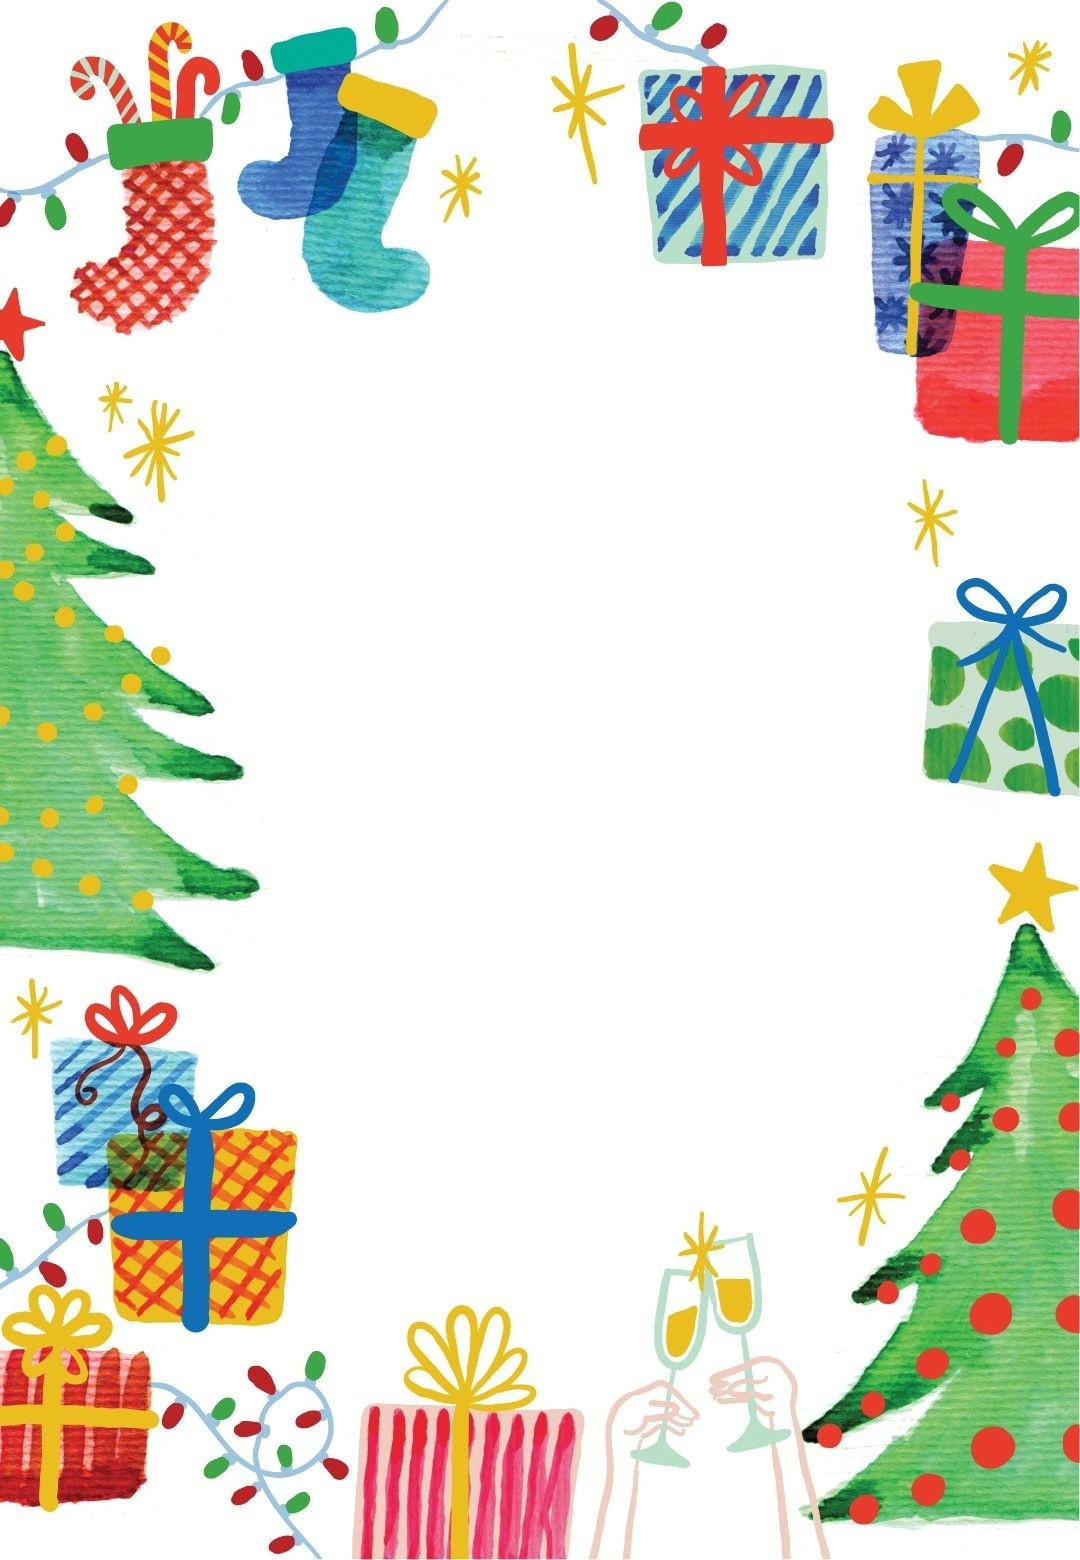 Free Printable Christmas Invitation Templates Greetings Island - Greetings Island Free Printable Invitations